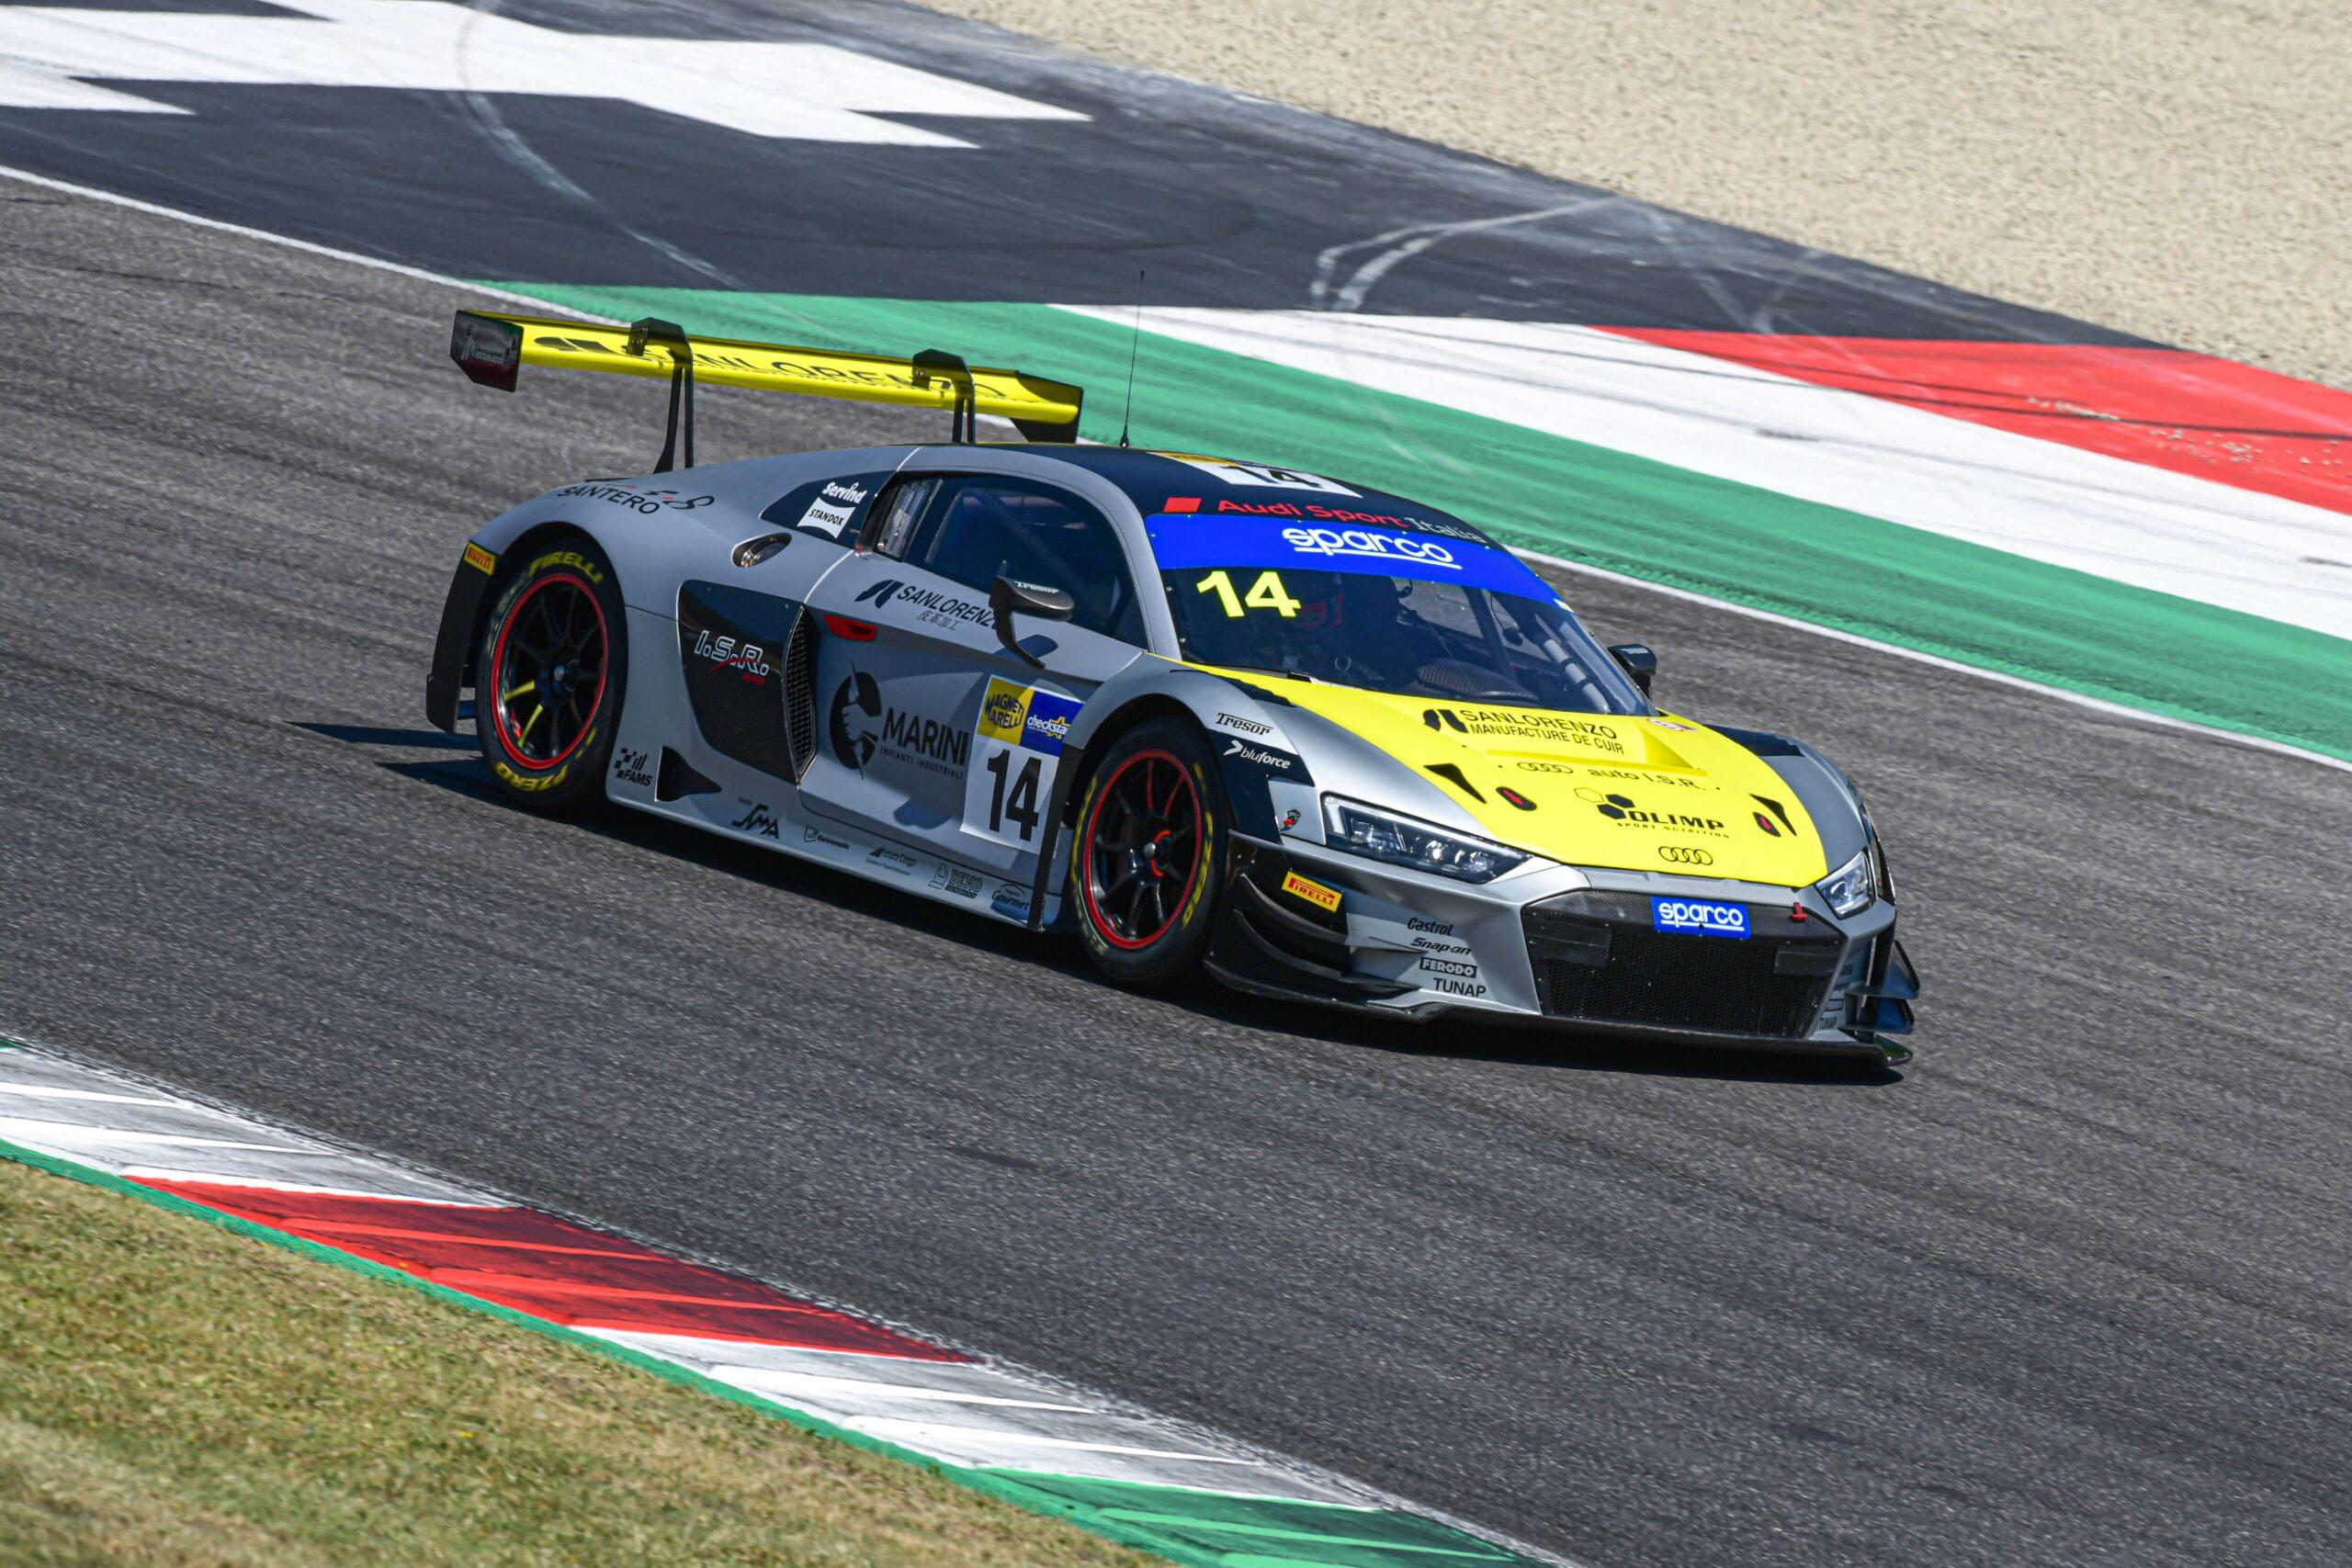 Filip Salaquarda-Karol Basz-Vito Postiglione, Audi R8 LMS #14, Audi Sport Italia